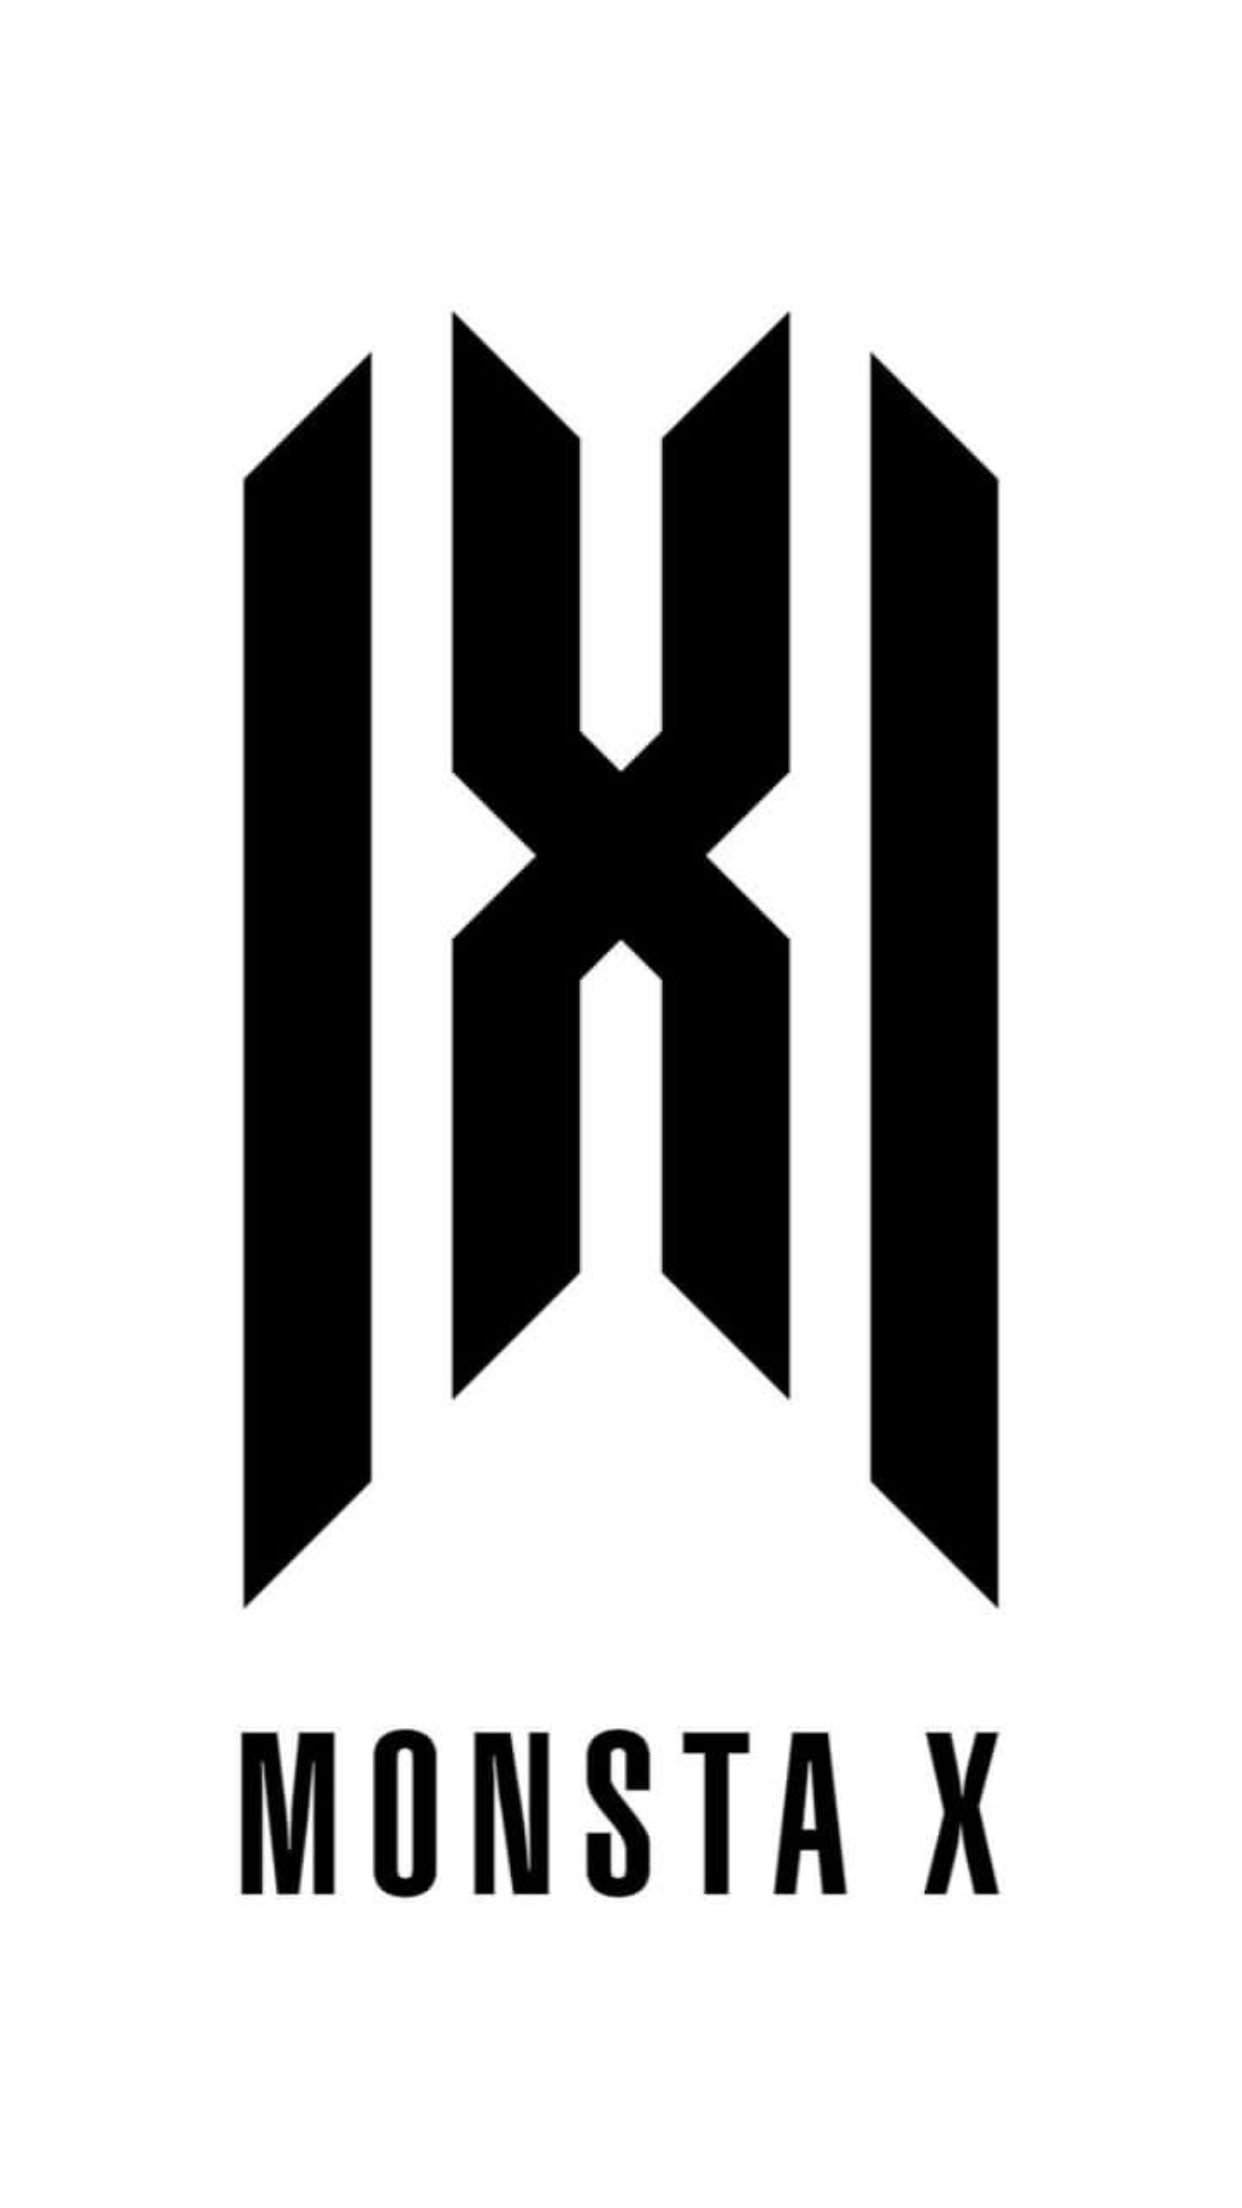 Pin de Max Heriot en MONSTA X | Pegatinas imprimibles, Fondos de ...